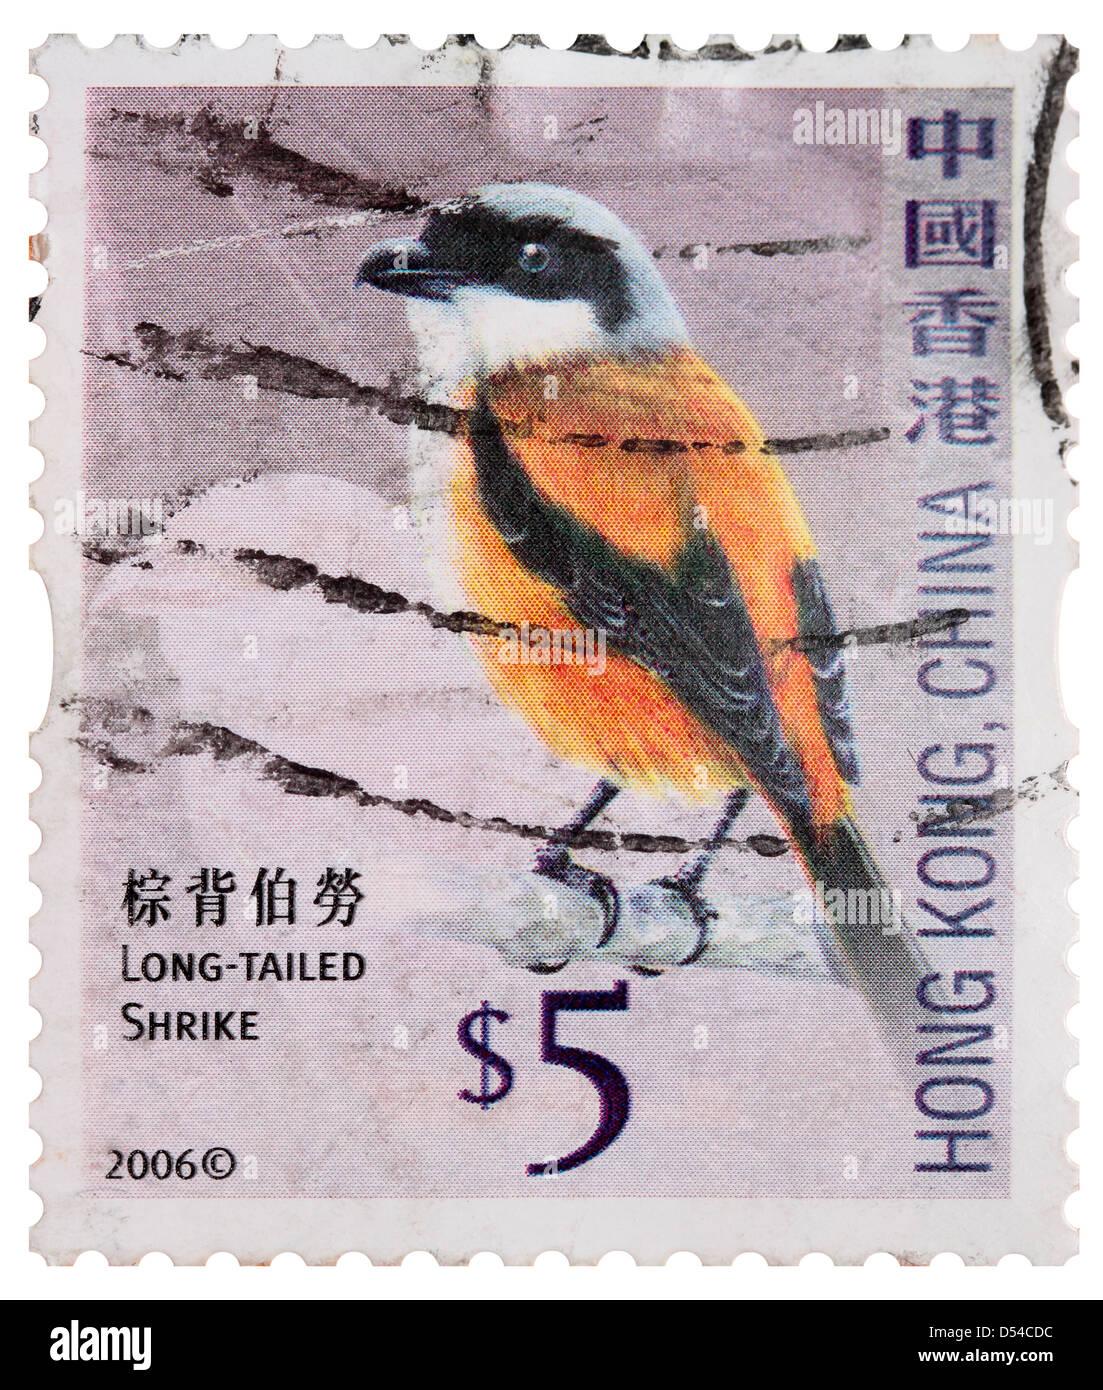 Used Five Hong Kong Dollar Postage Stamp - Long-Tailed Shrike - Stock Image